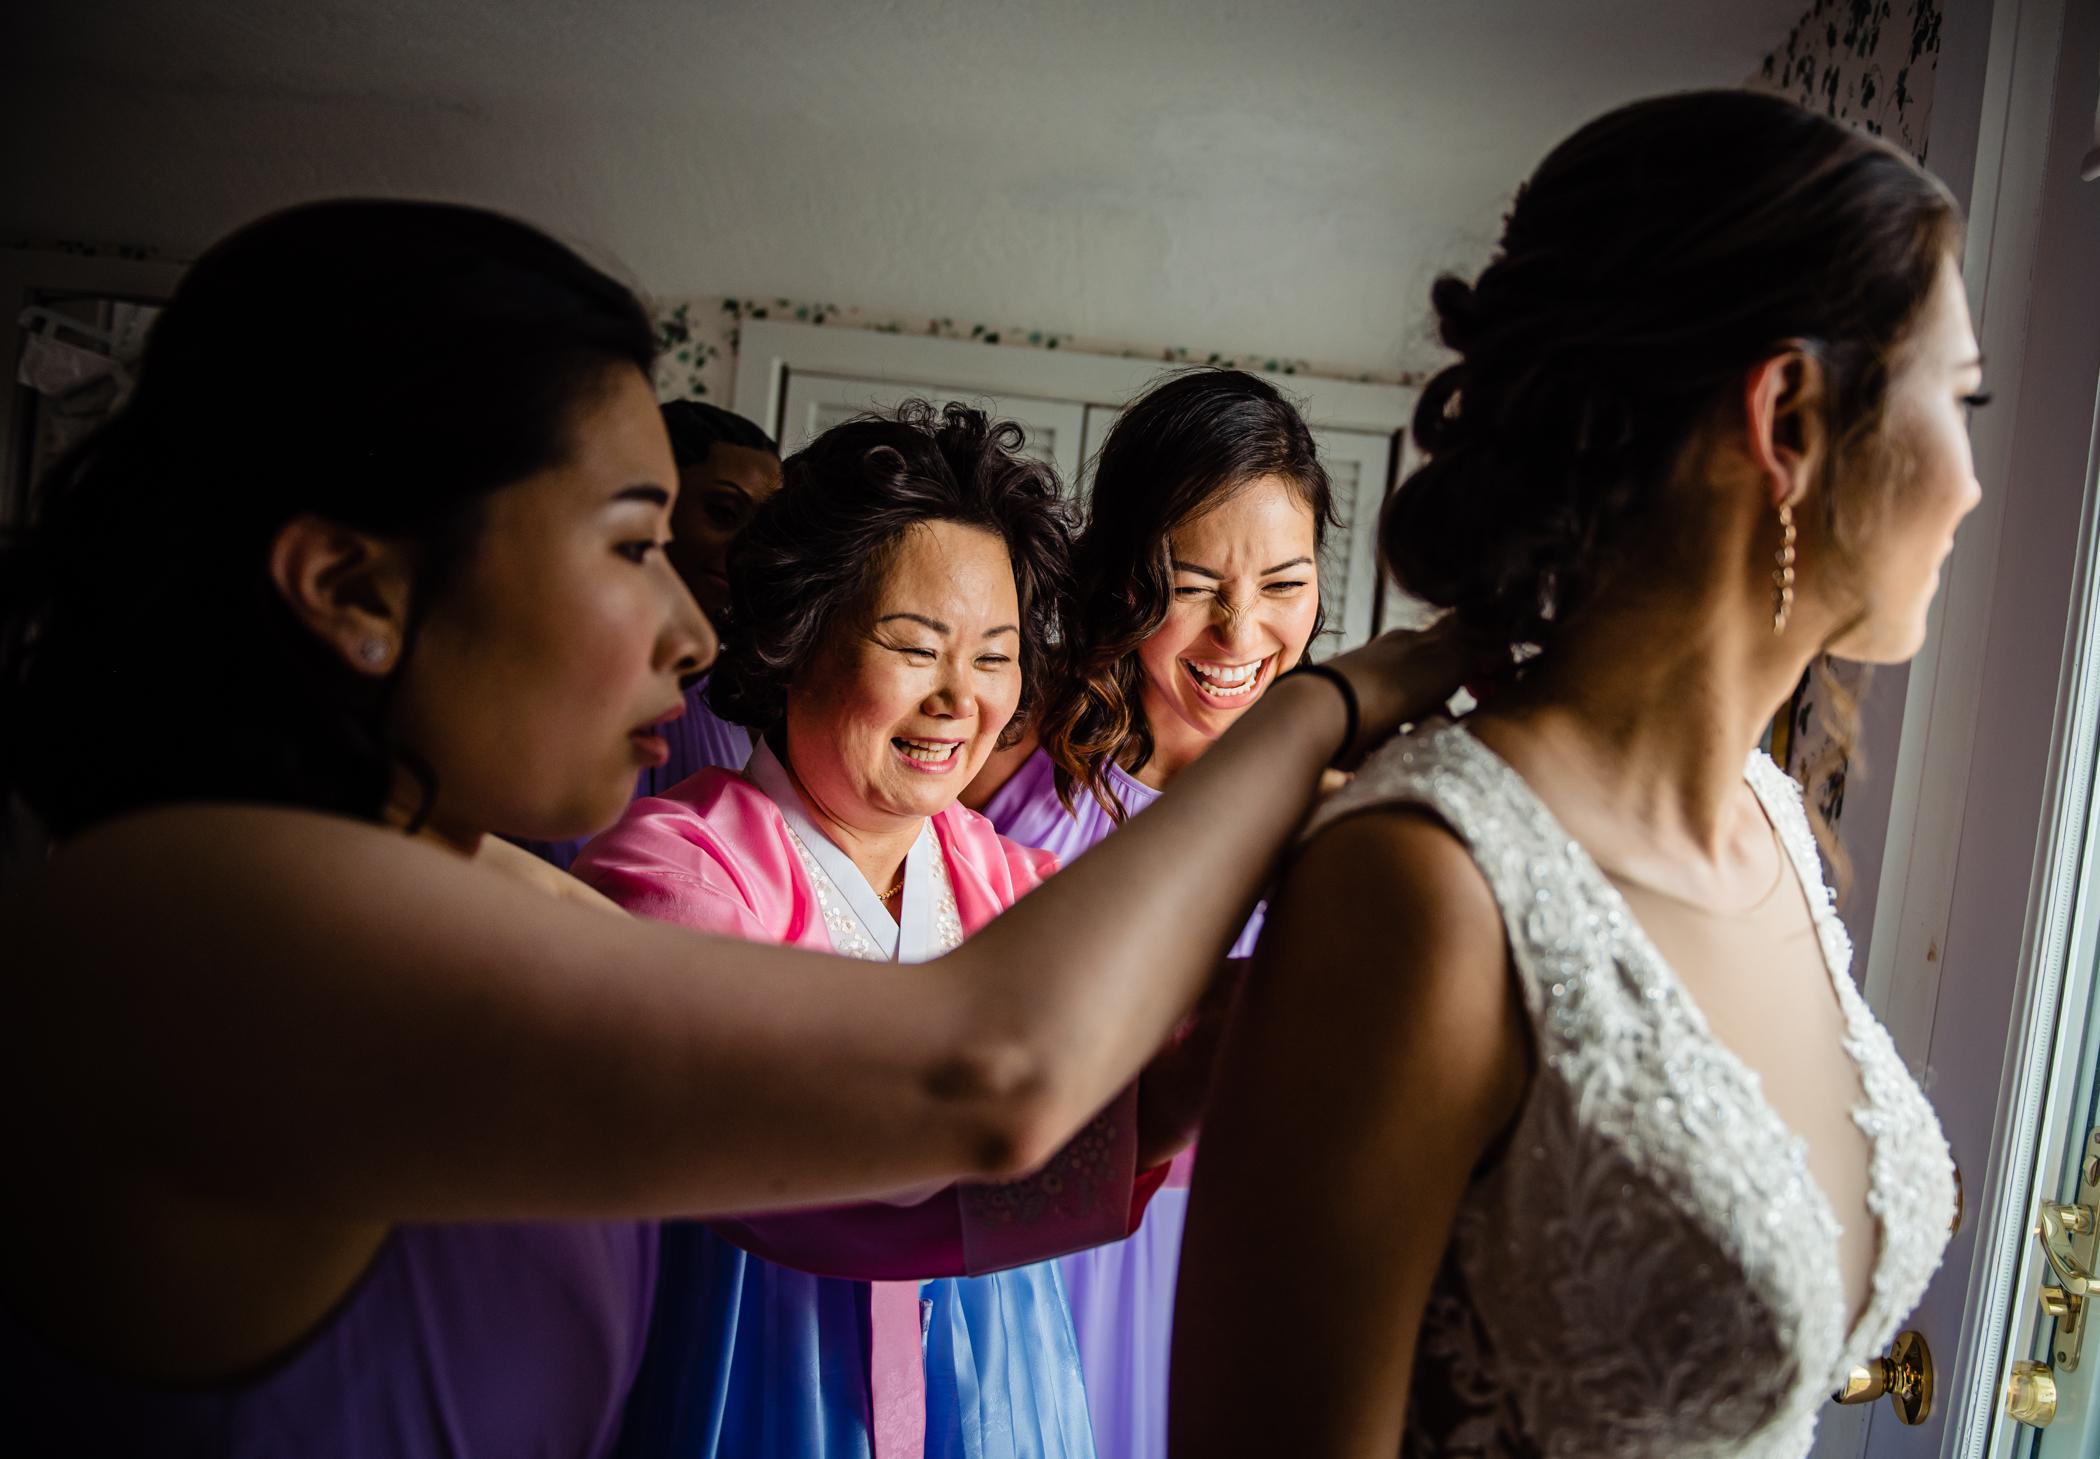 artistic-wedding-photographers-connecticut-chris-nachtwey-photography-2019-1.jpg